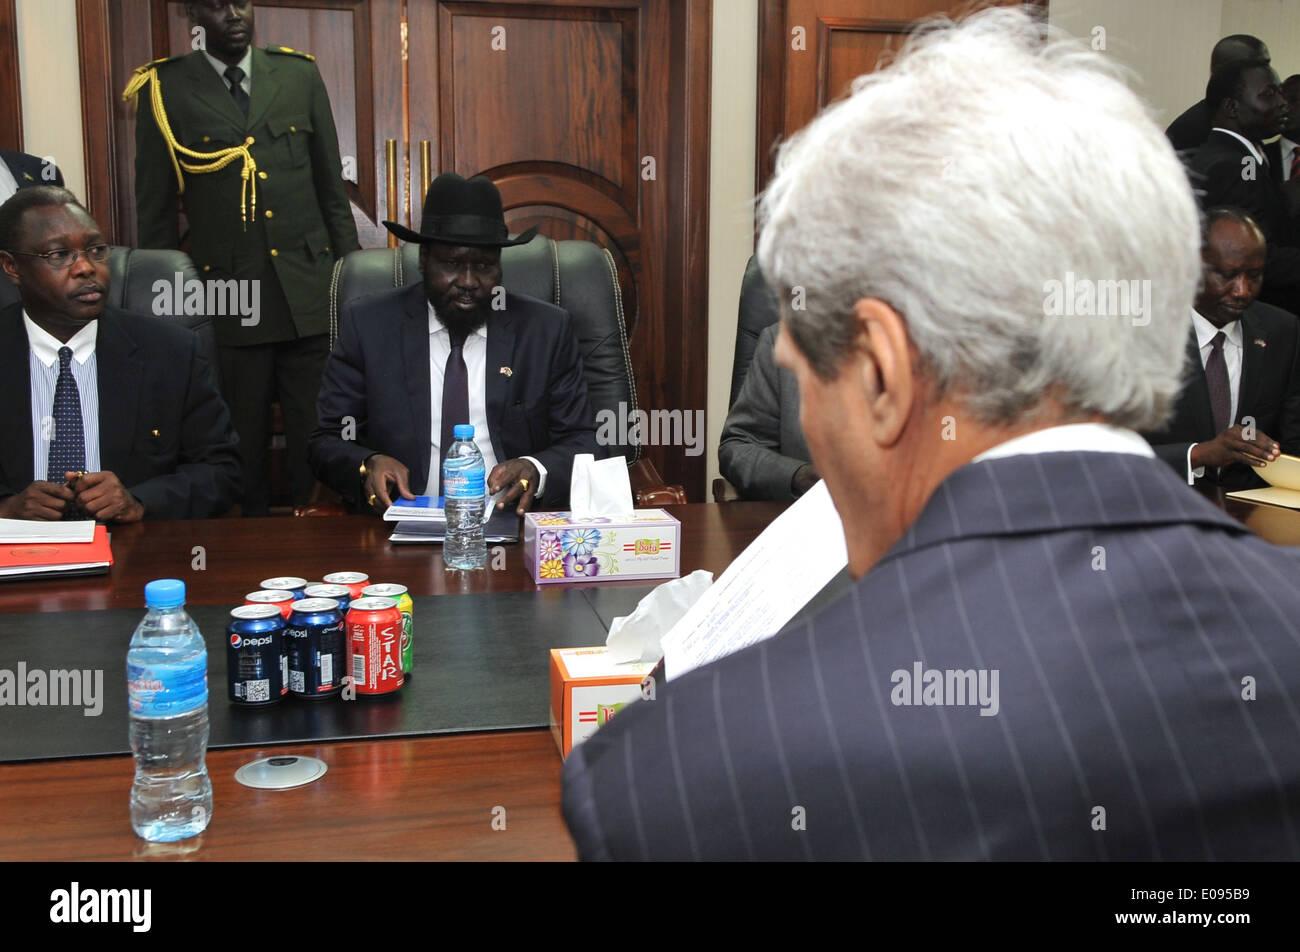 Secretary Kerry, South Sudanese President Kiir Look Over Notes Before Meeting in Juba - Stock Image